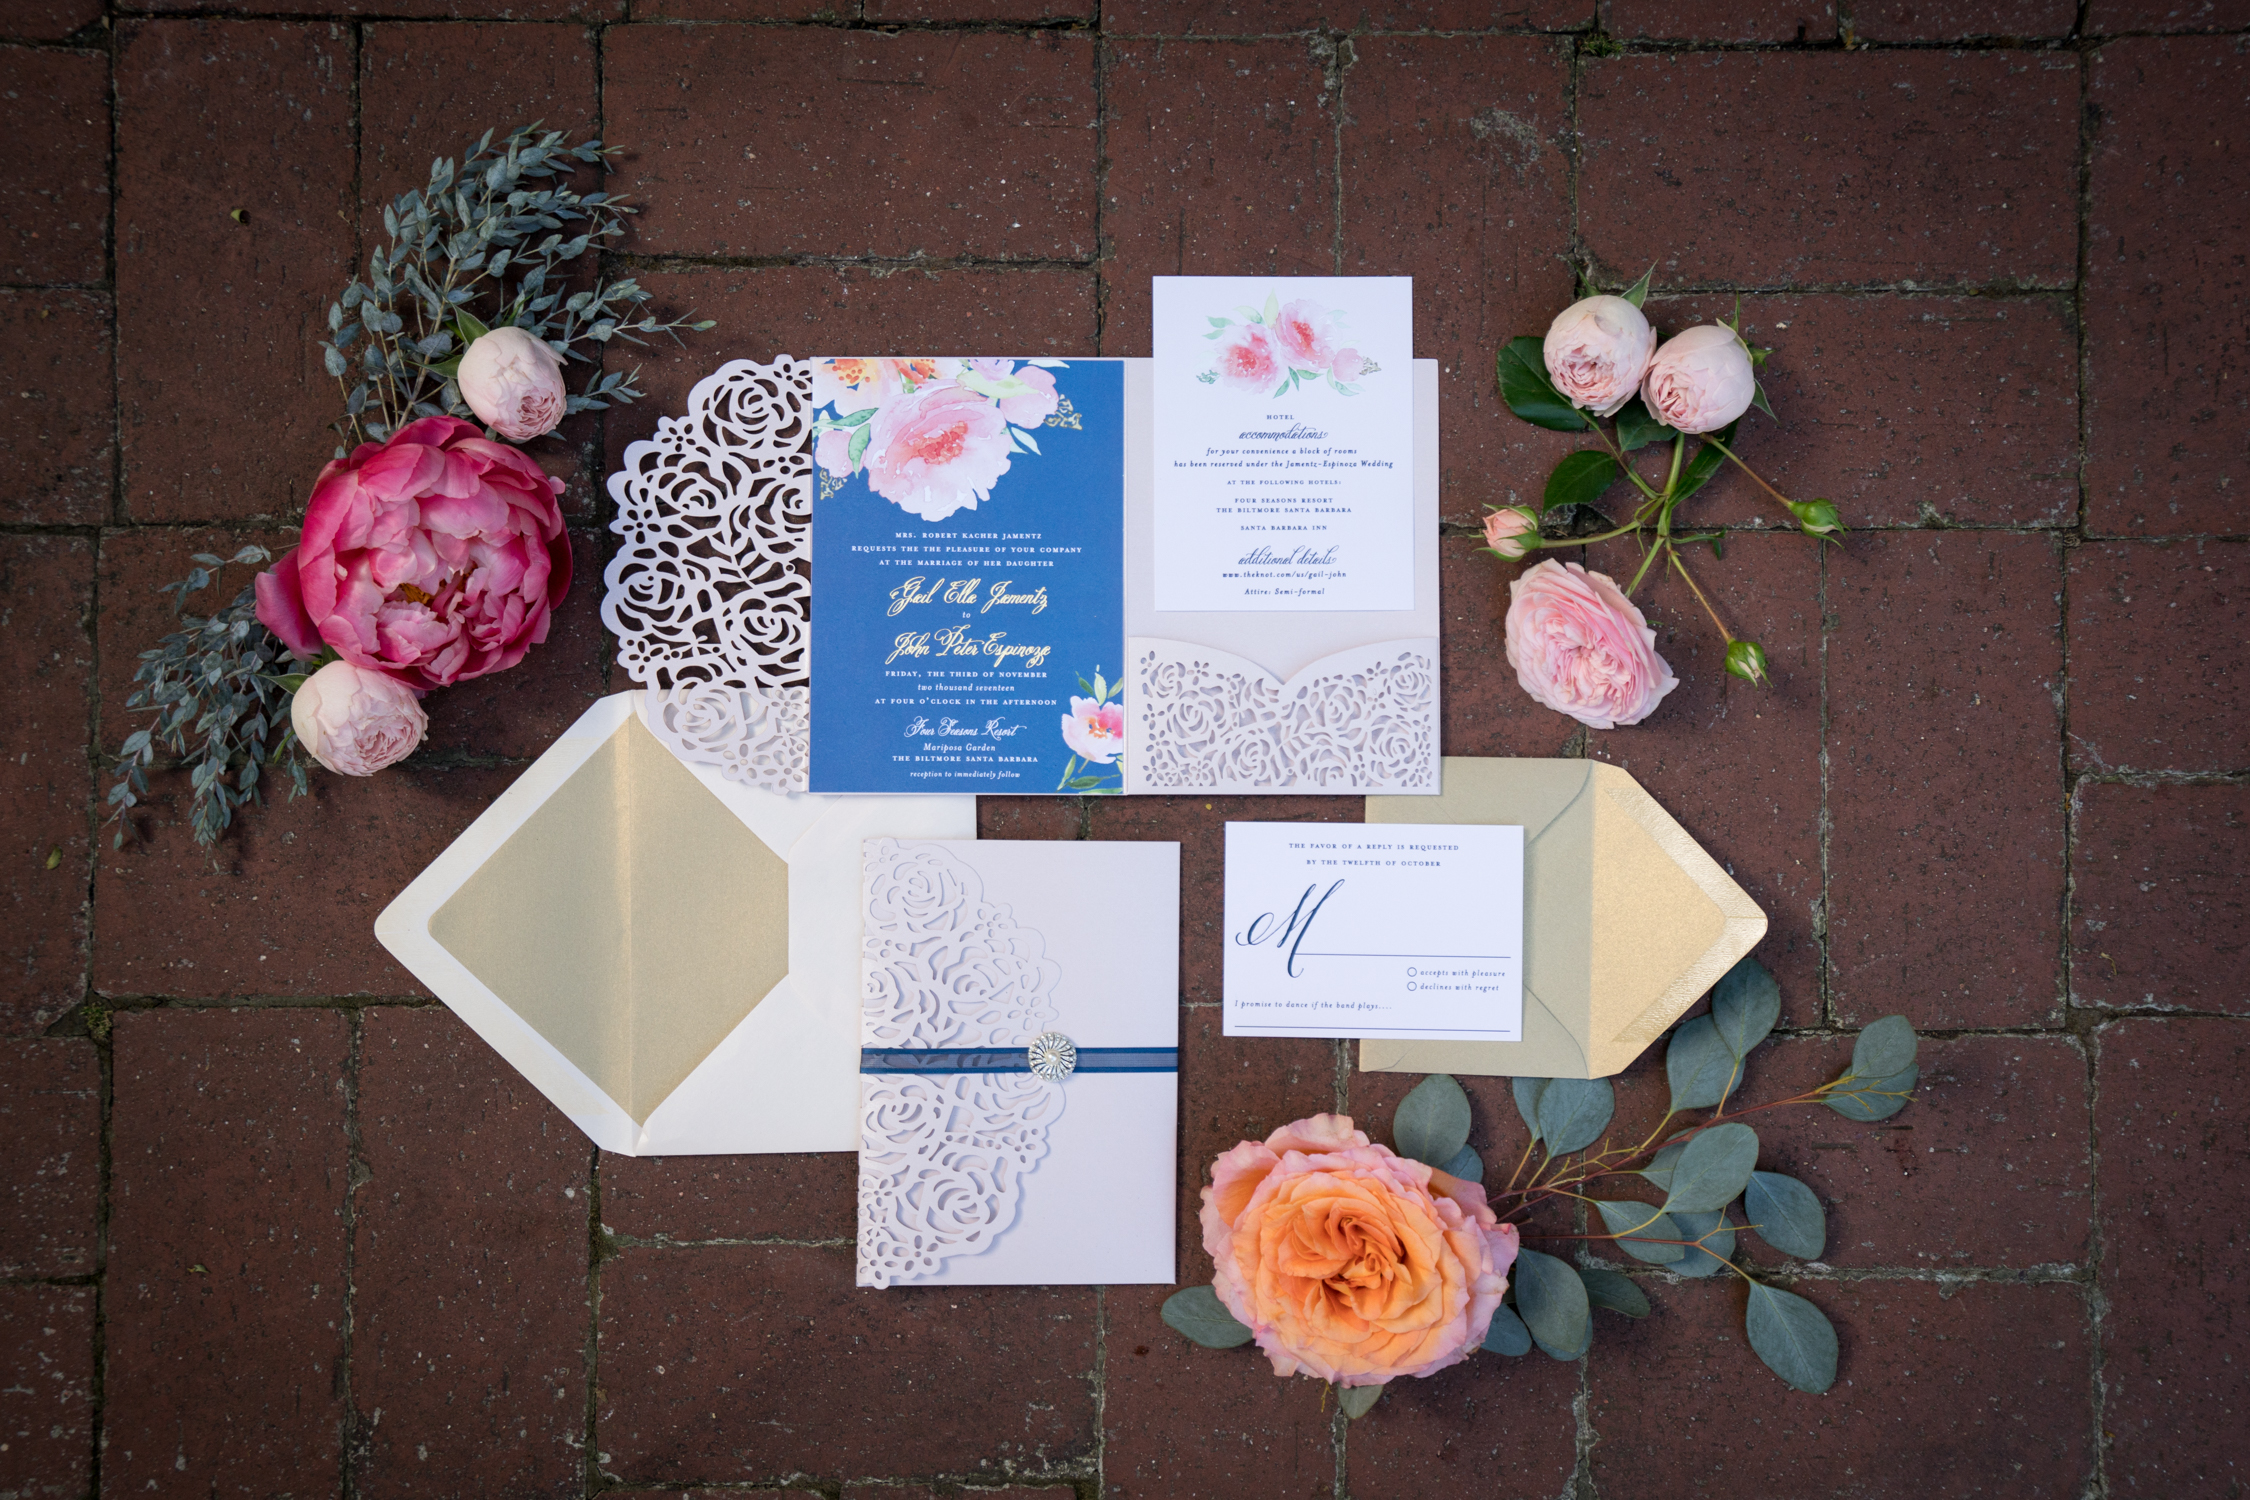 www.santabarbarawedding.com | Miki & Sonja Photography | Four Seasons Resort The Biltmore | Imagine Weddings & Special Events | Rockrose Floral Design | Florals and Invitations